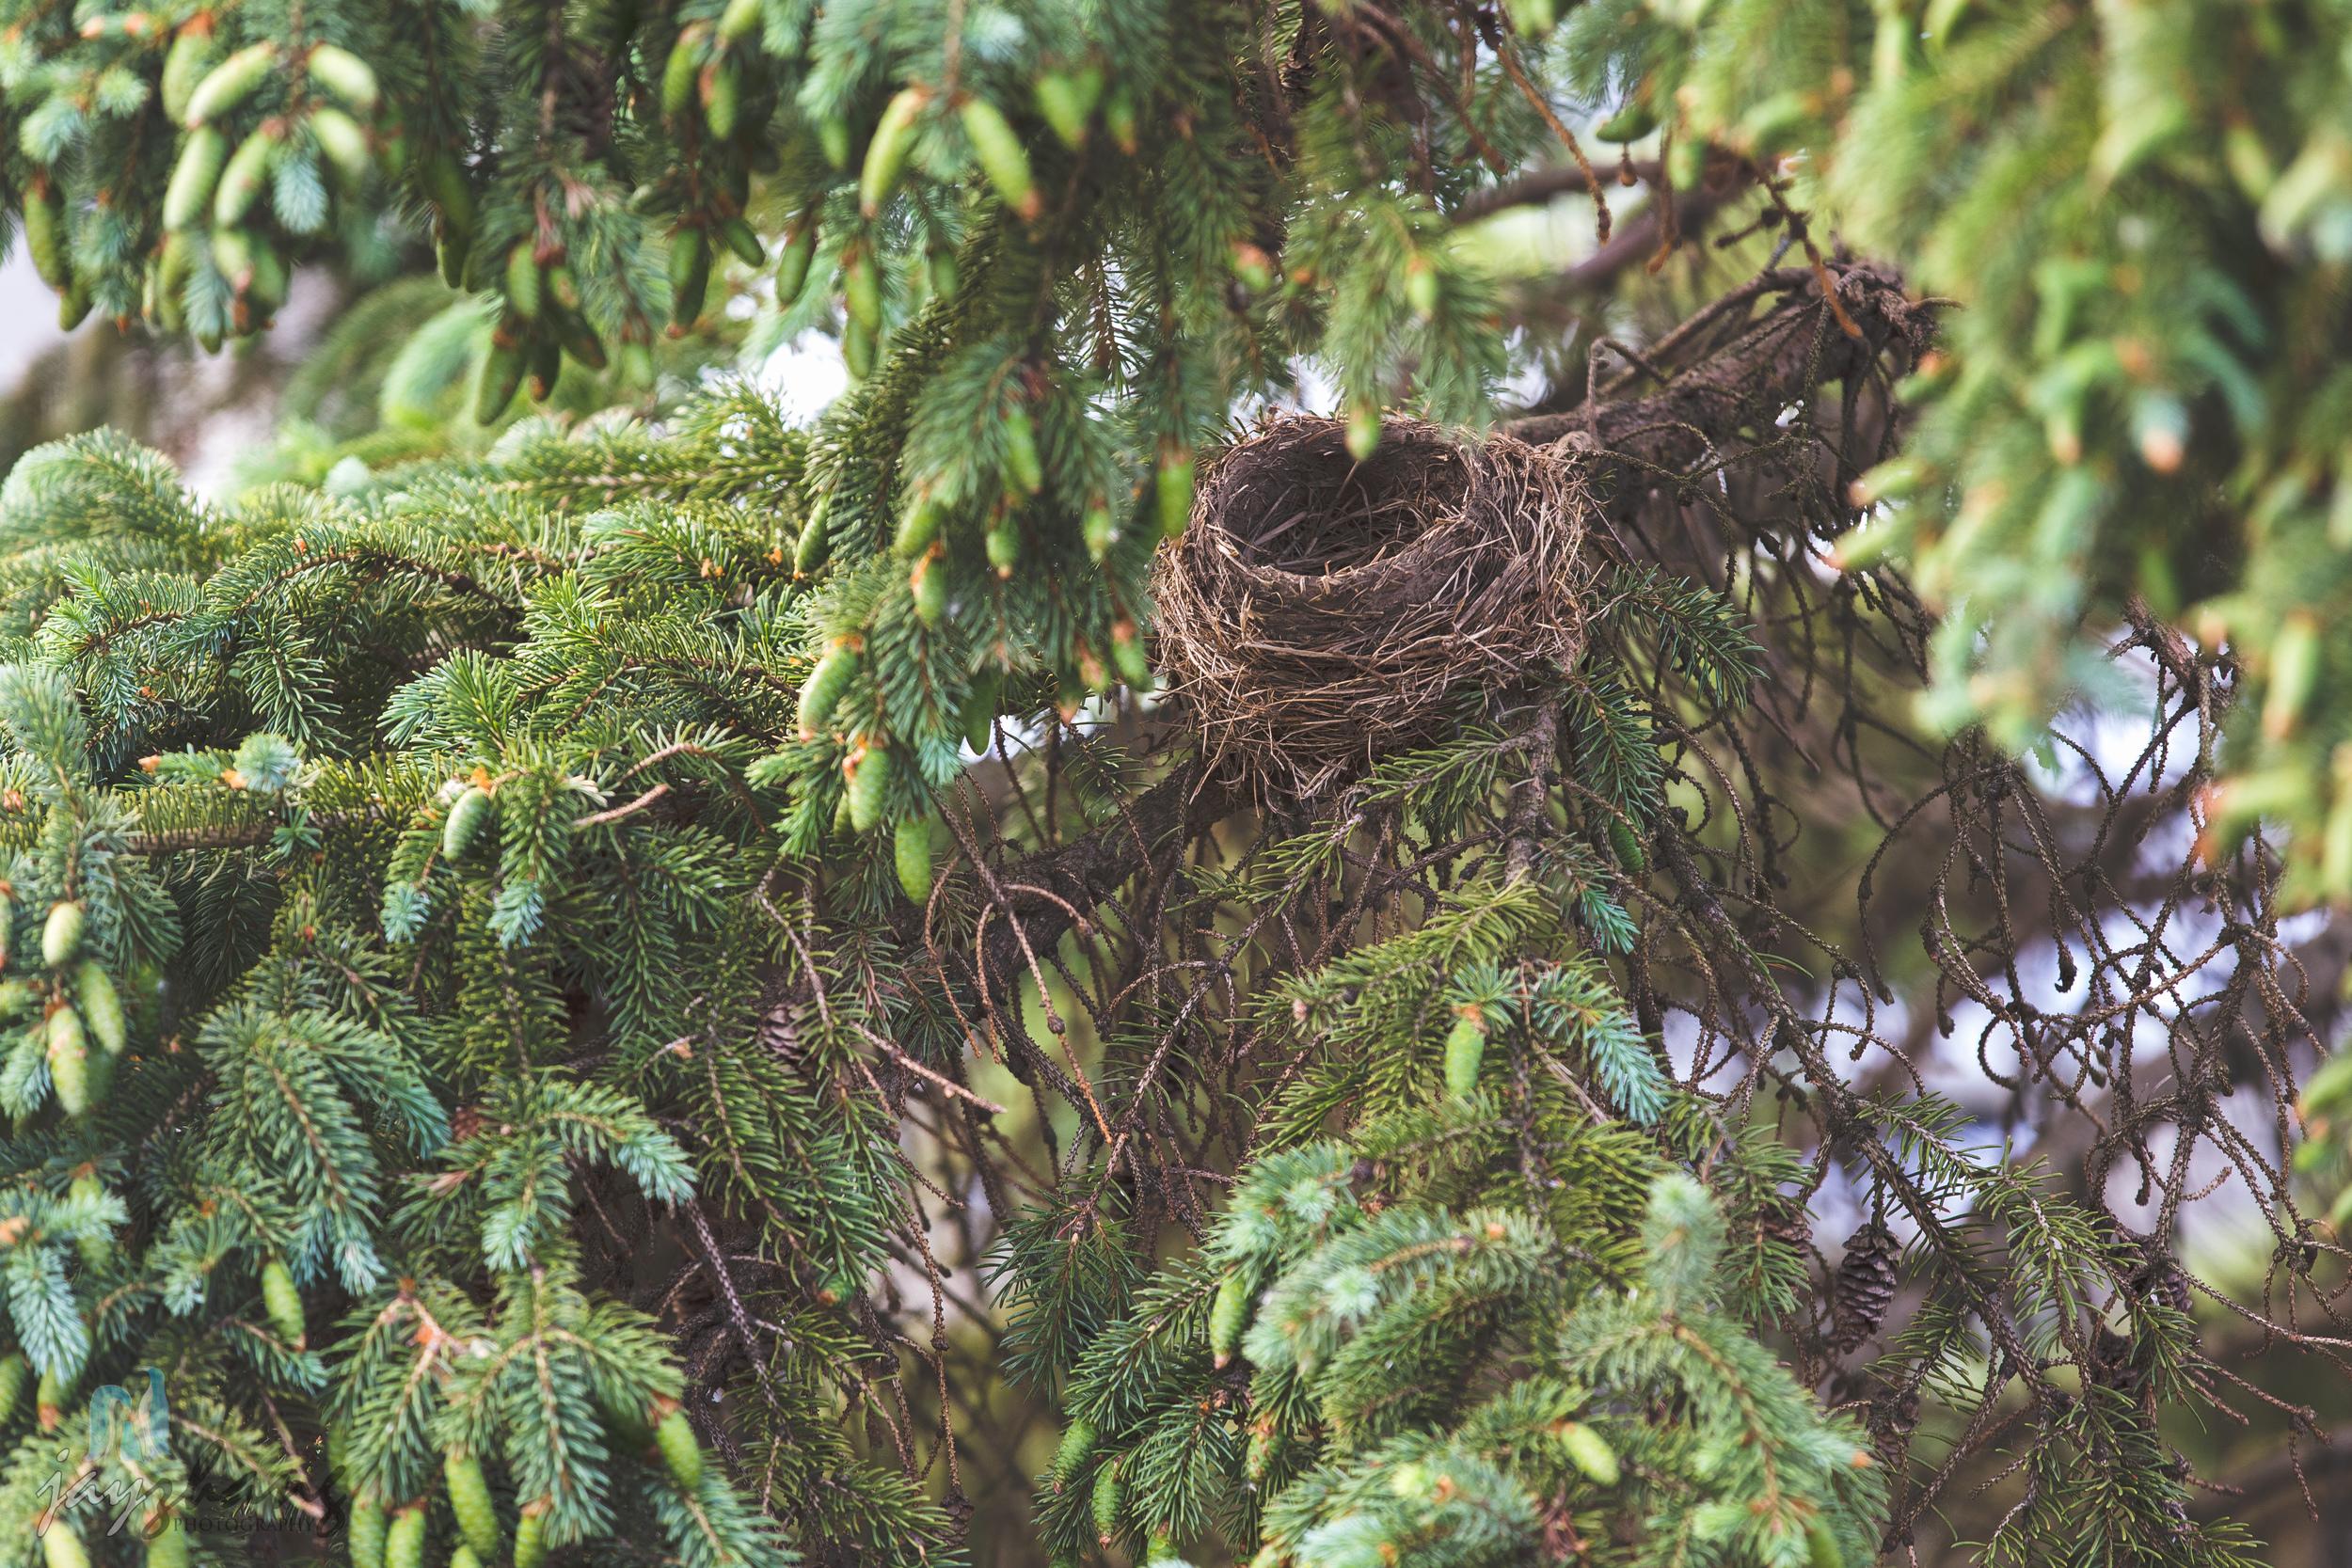 Day 154 - Empty Nest